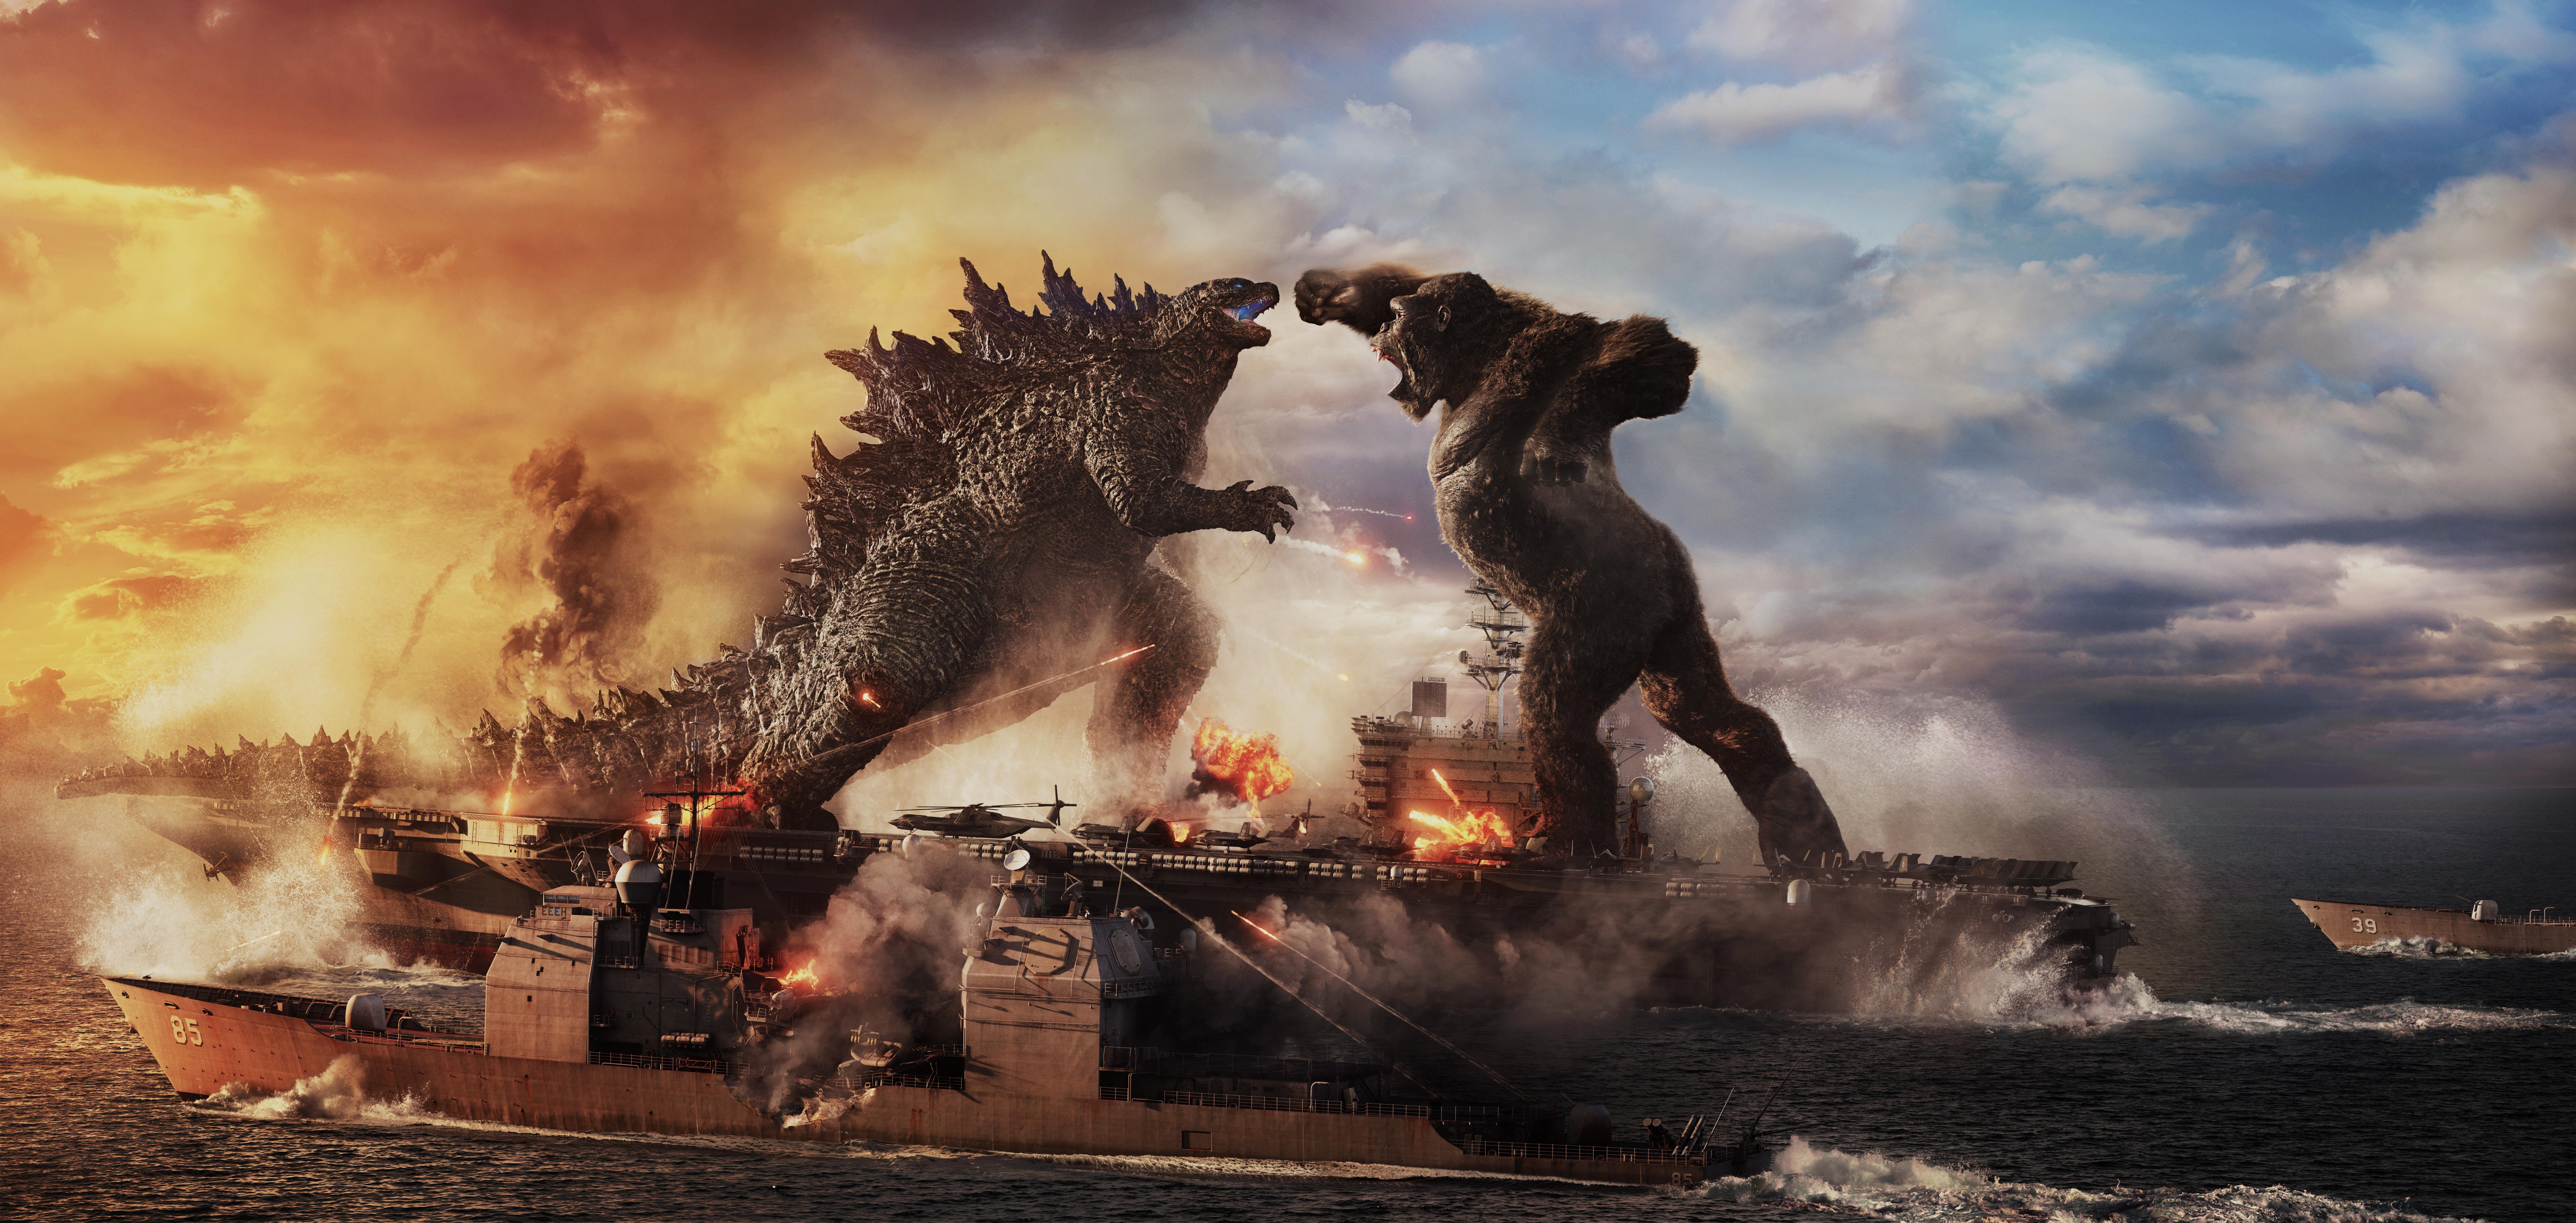 Godzilla vs. Kong: Successful theatrical release sets a record